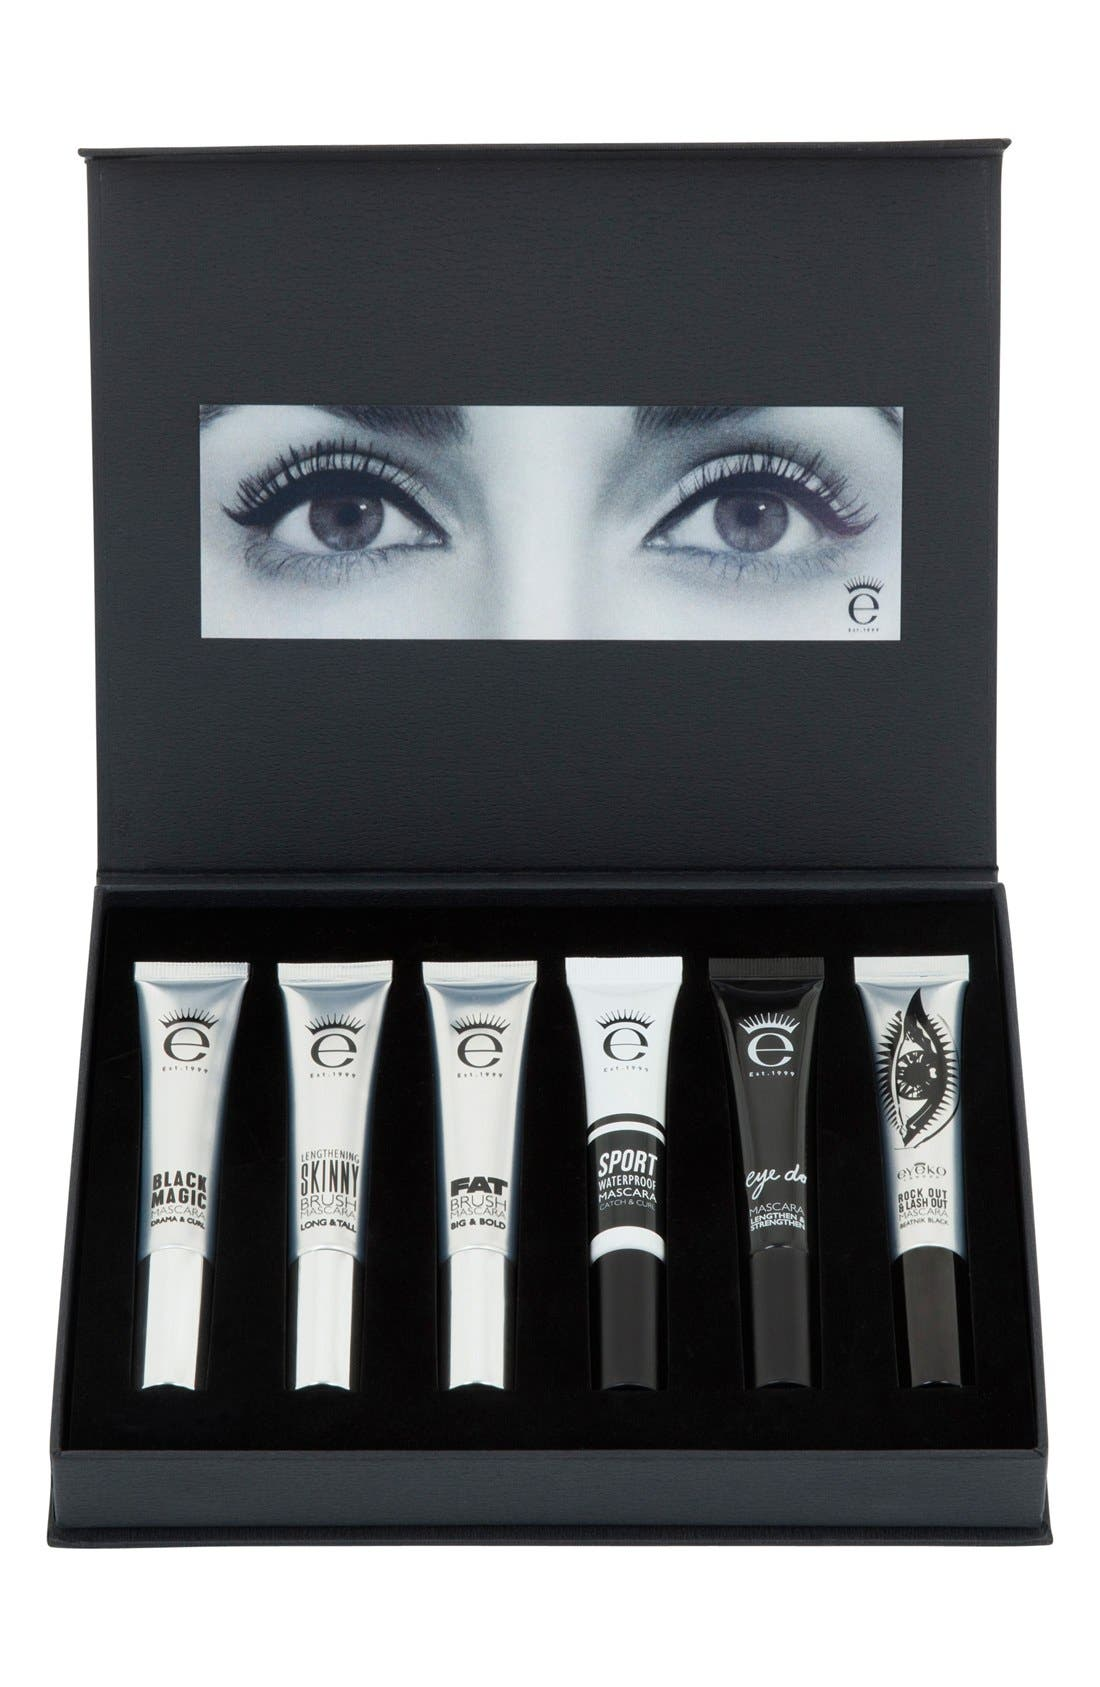 Eyeko Mascara Wardrobe™